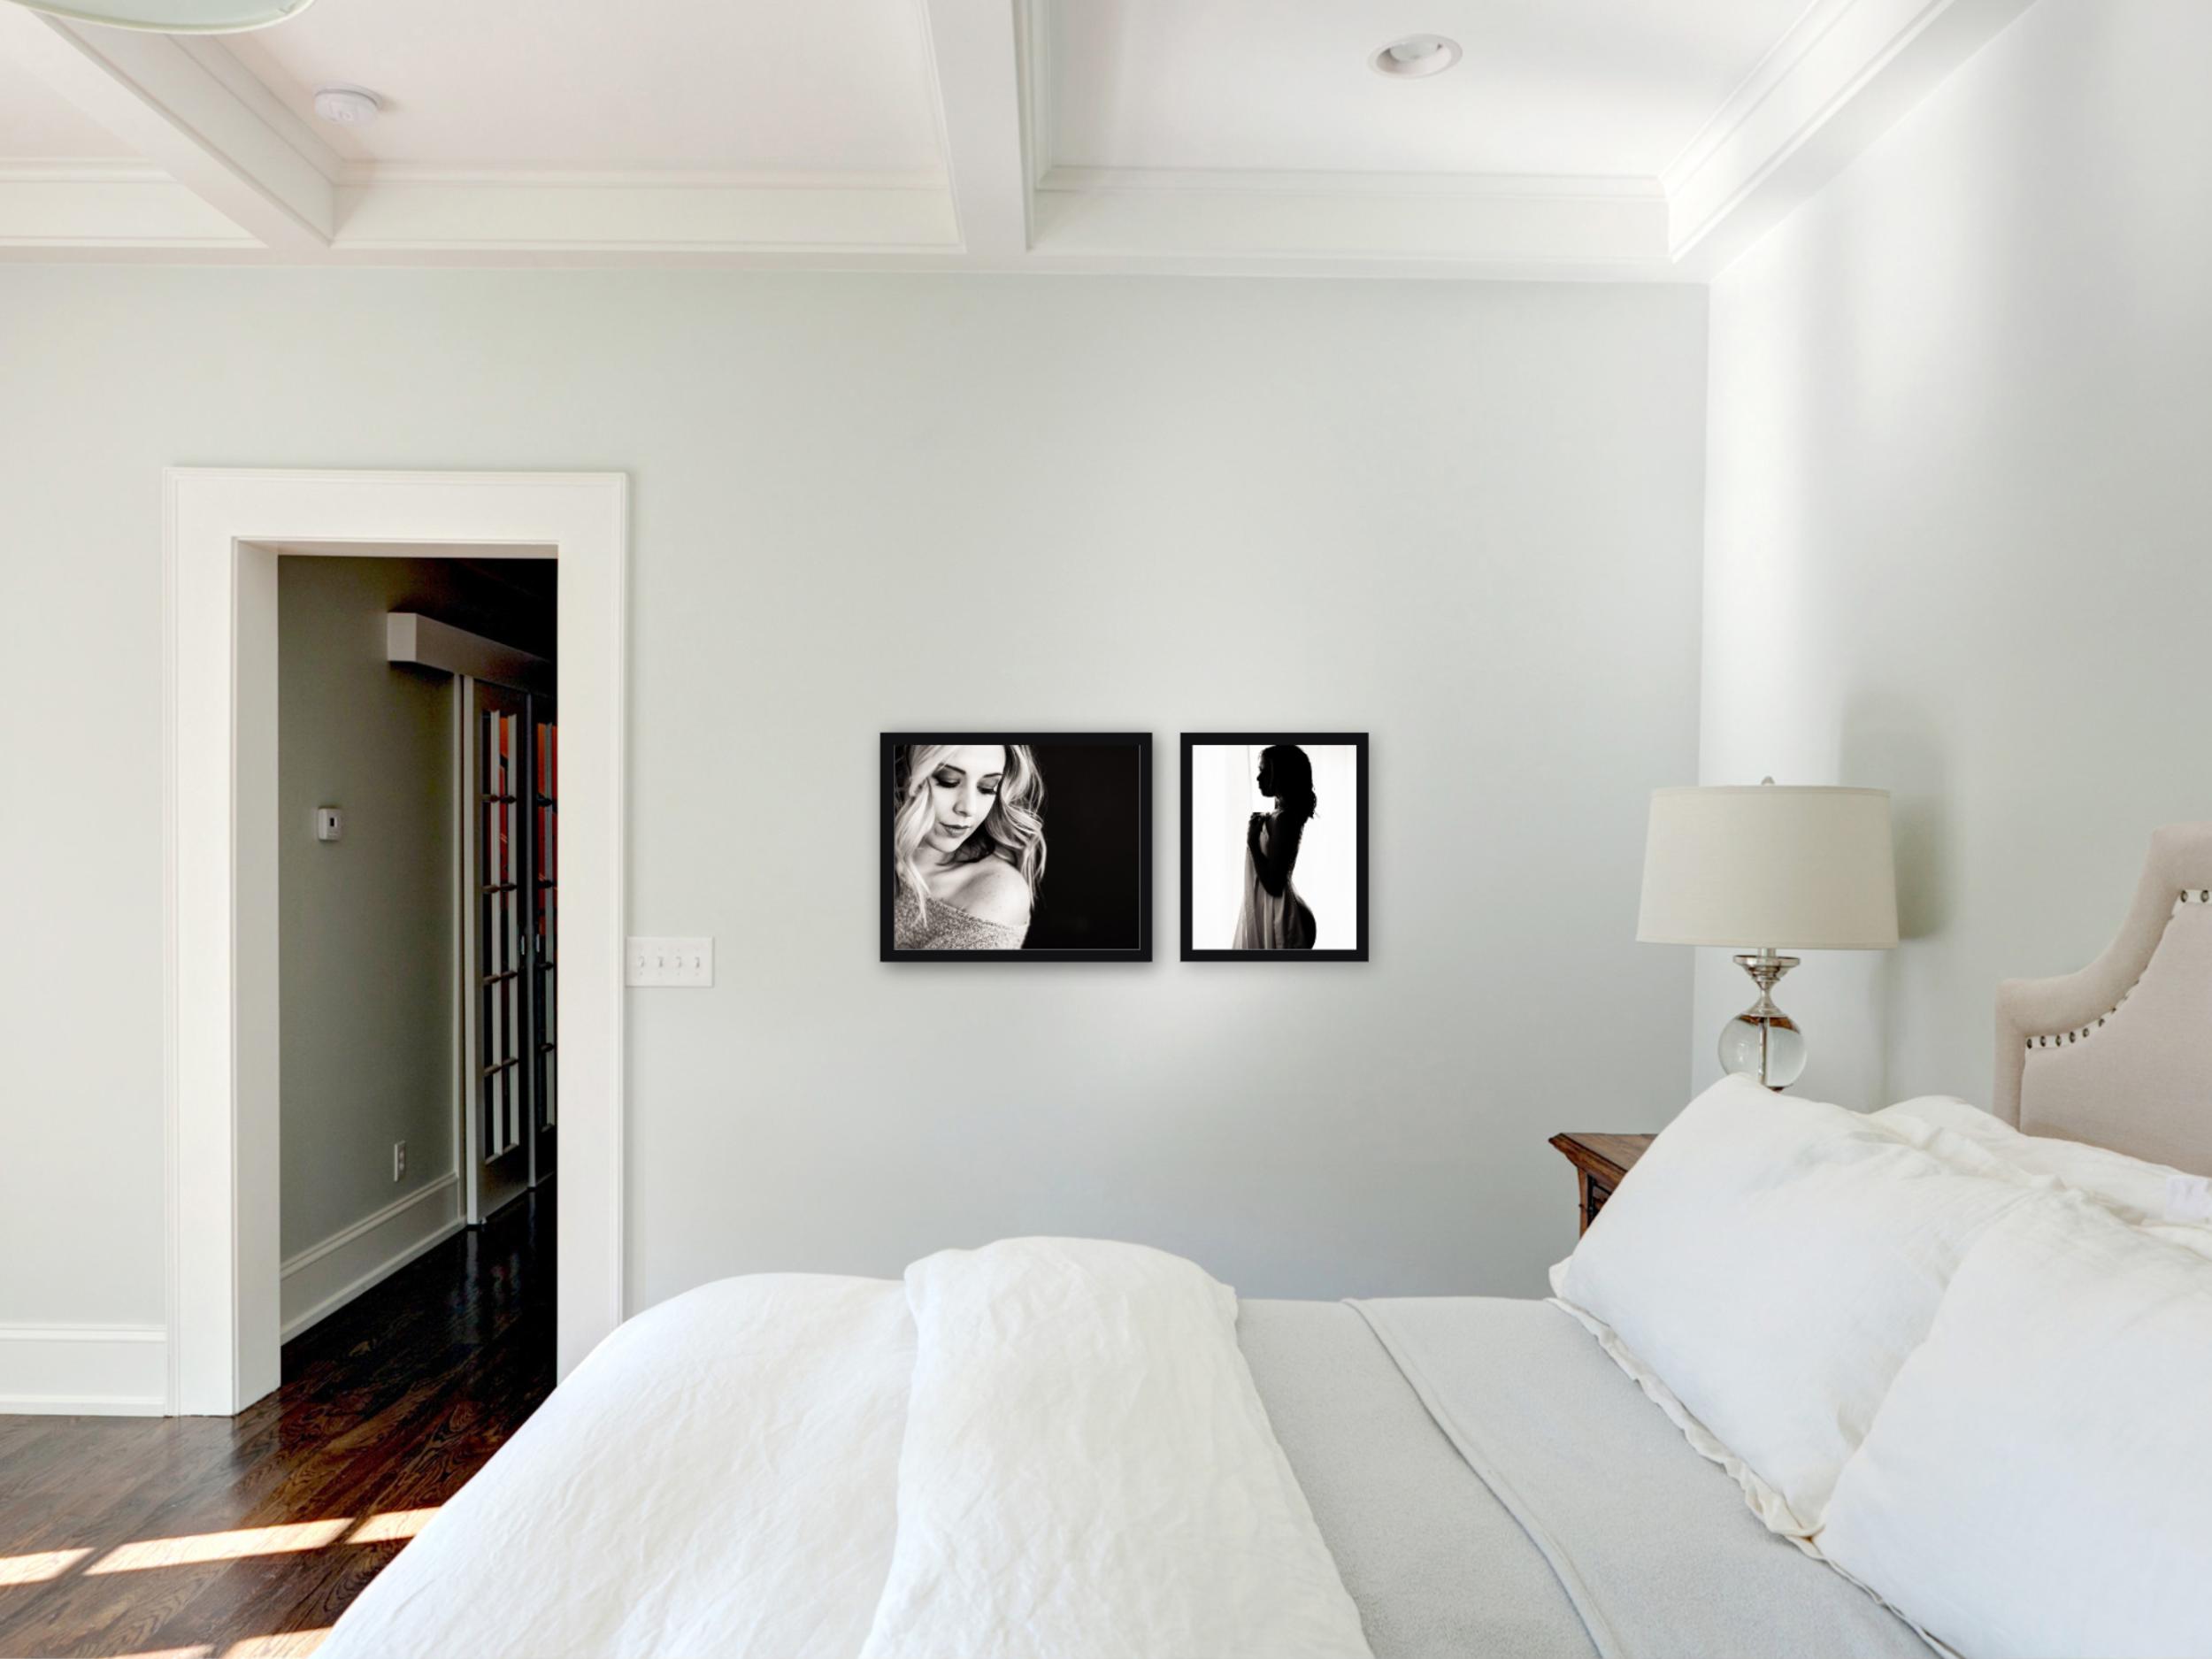 nashville-boudoir-wall-art